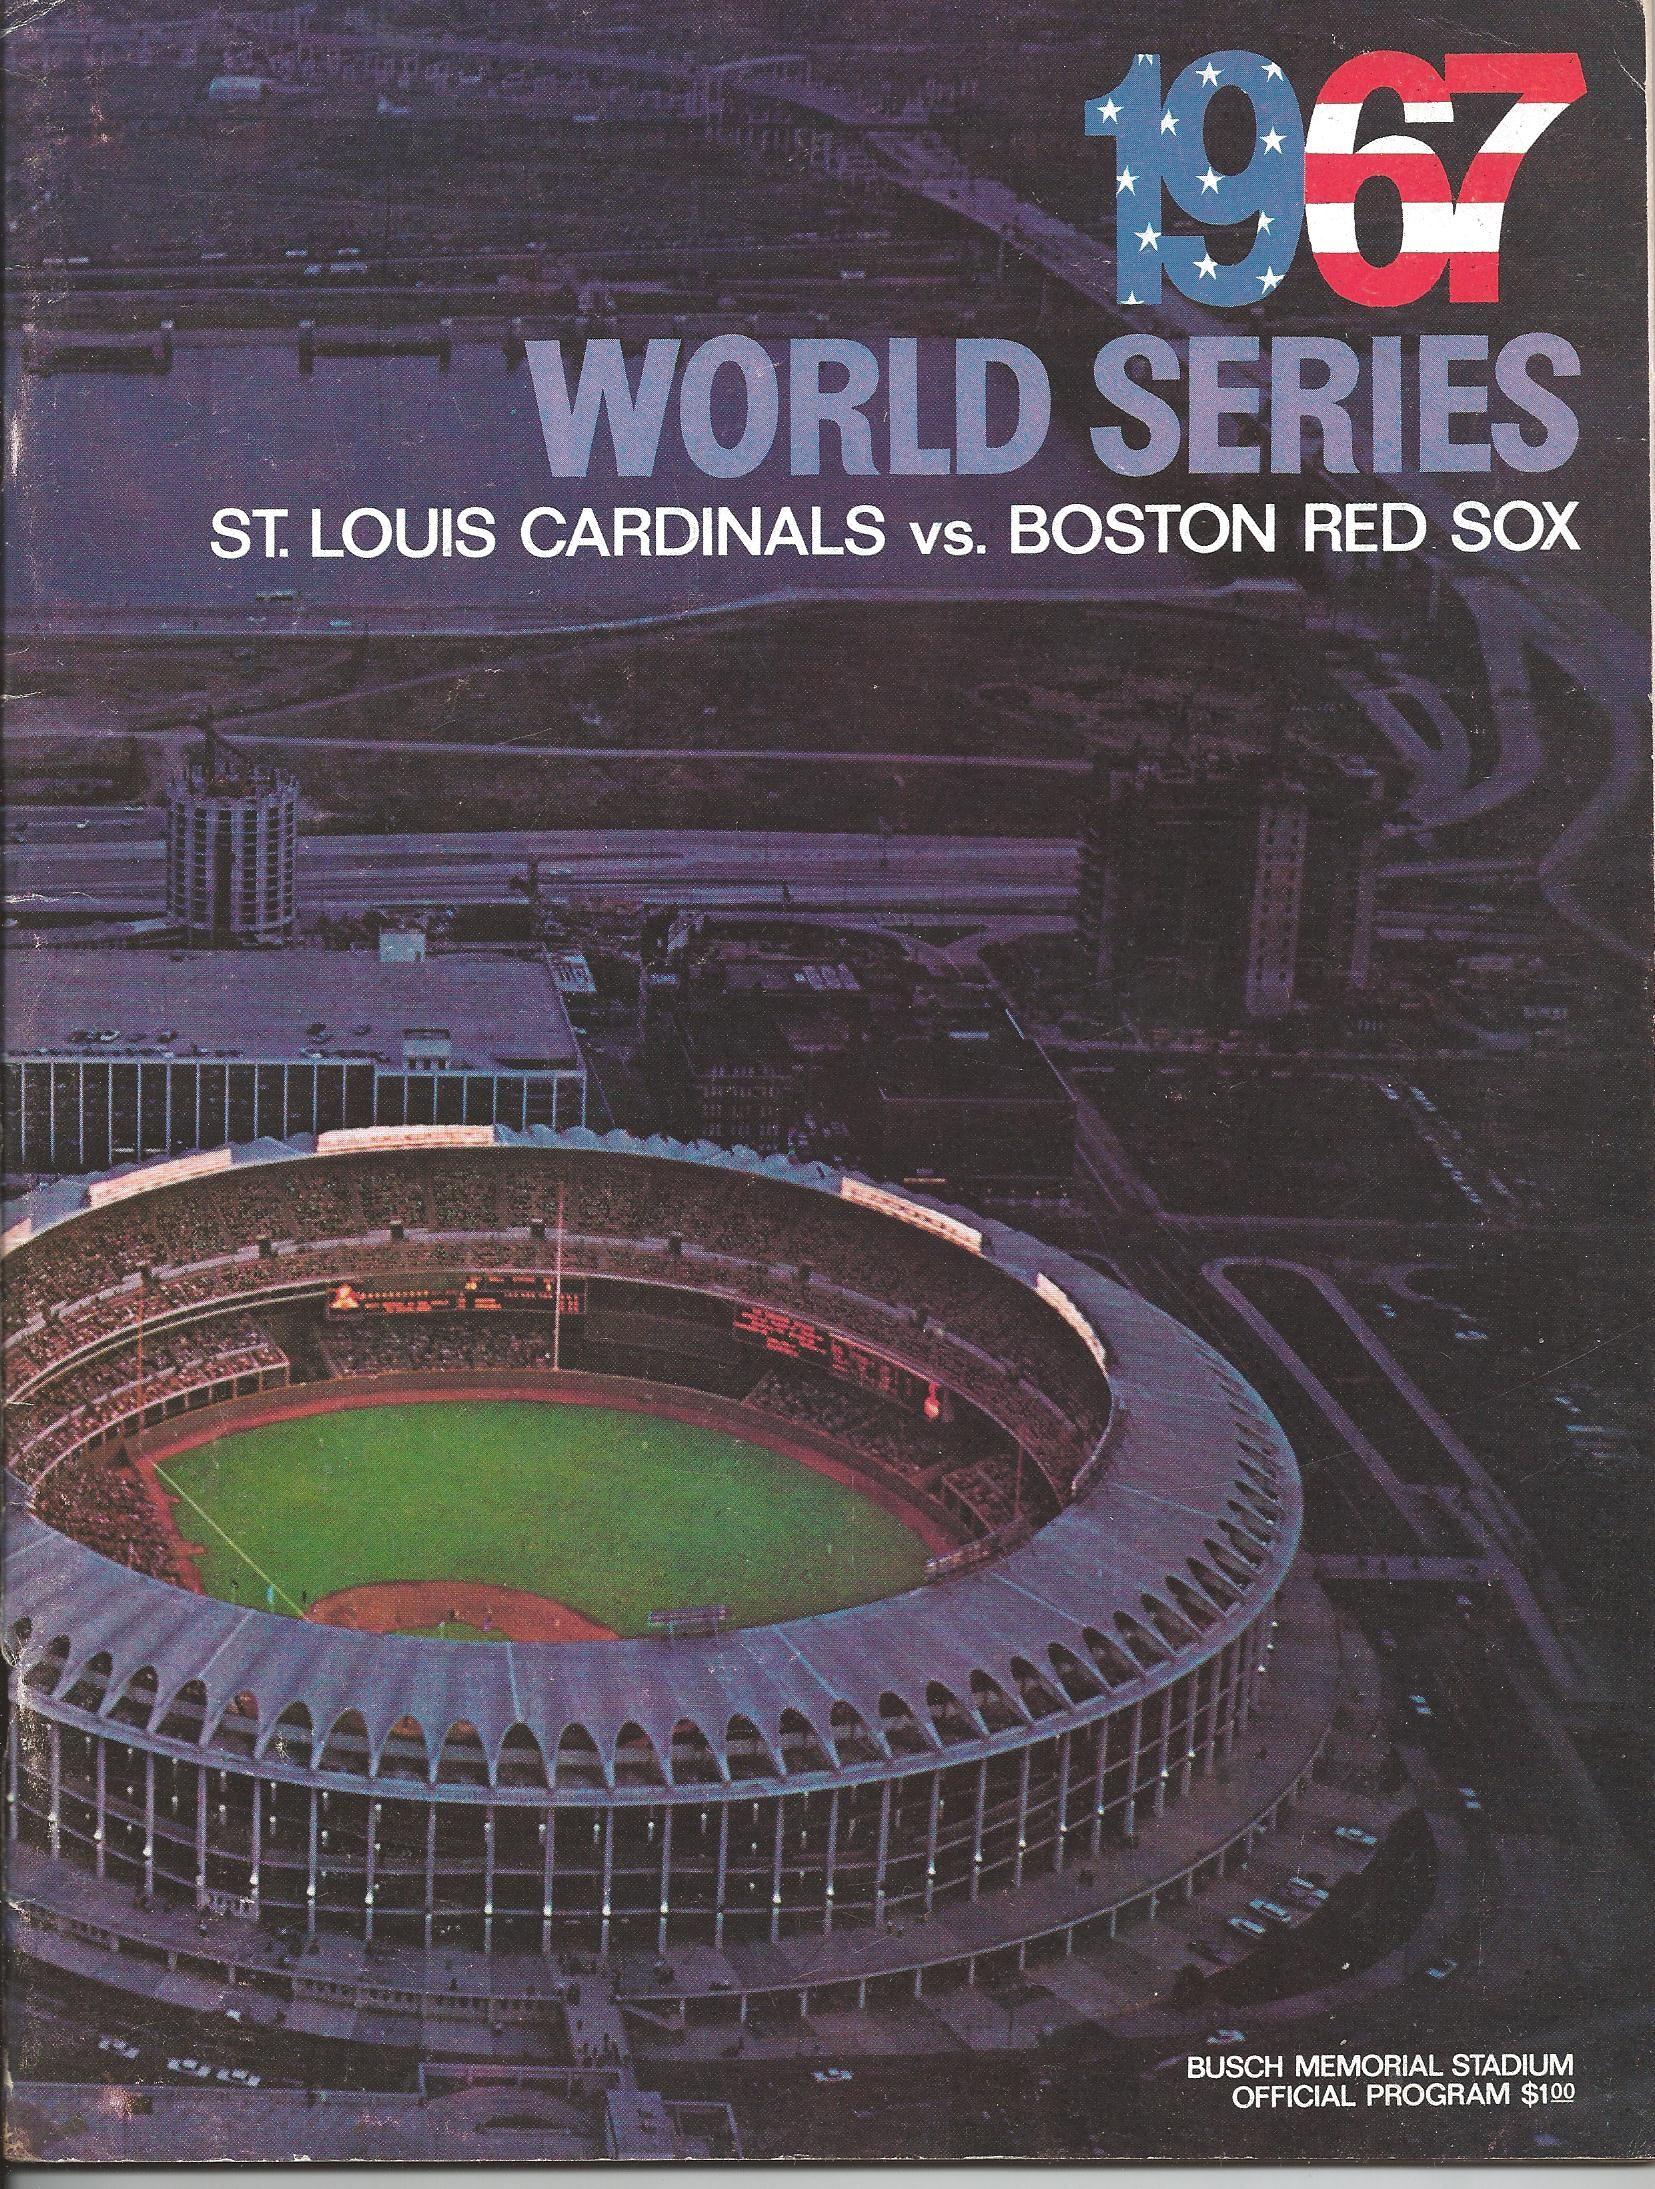 1967 World Series St Louis Cardinals 4 Boston Red Sox 3